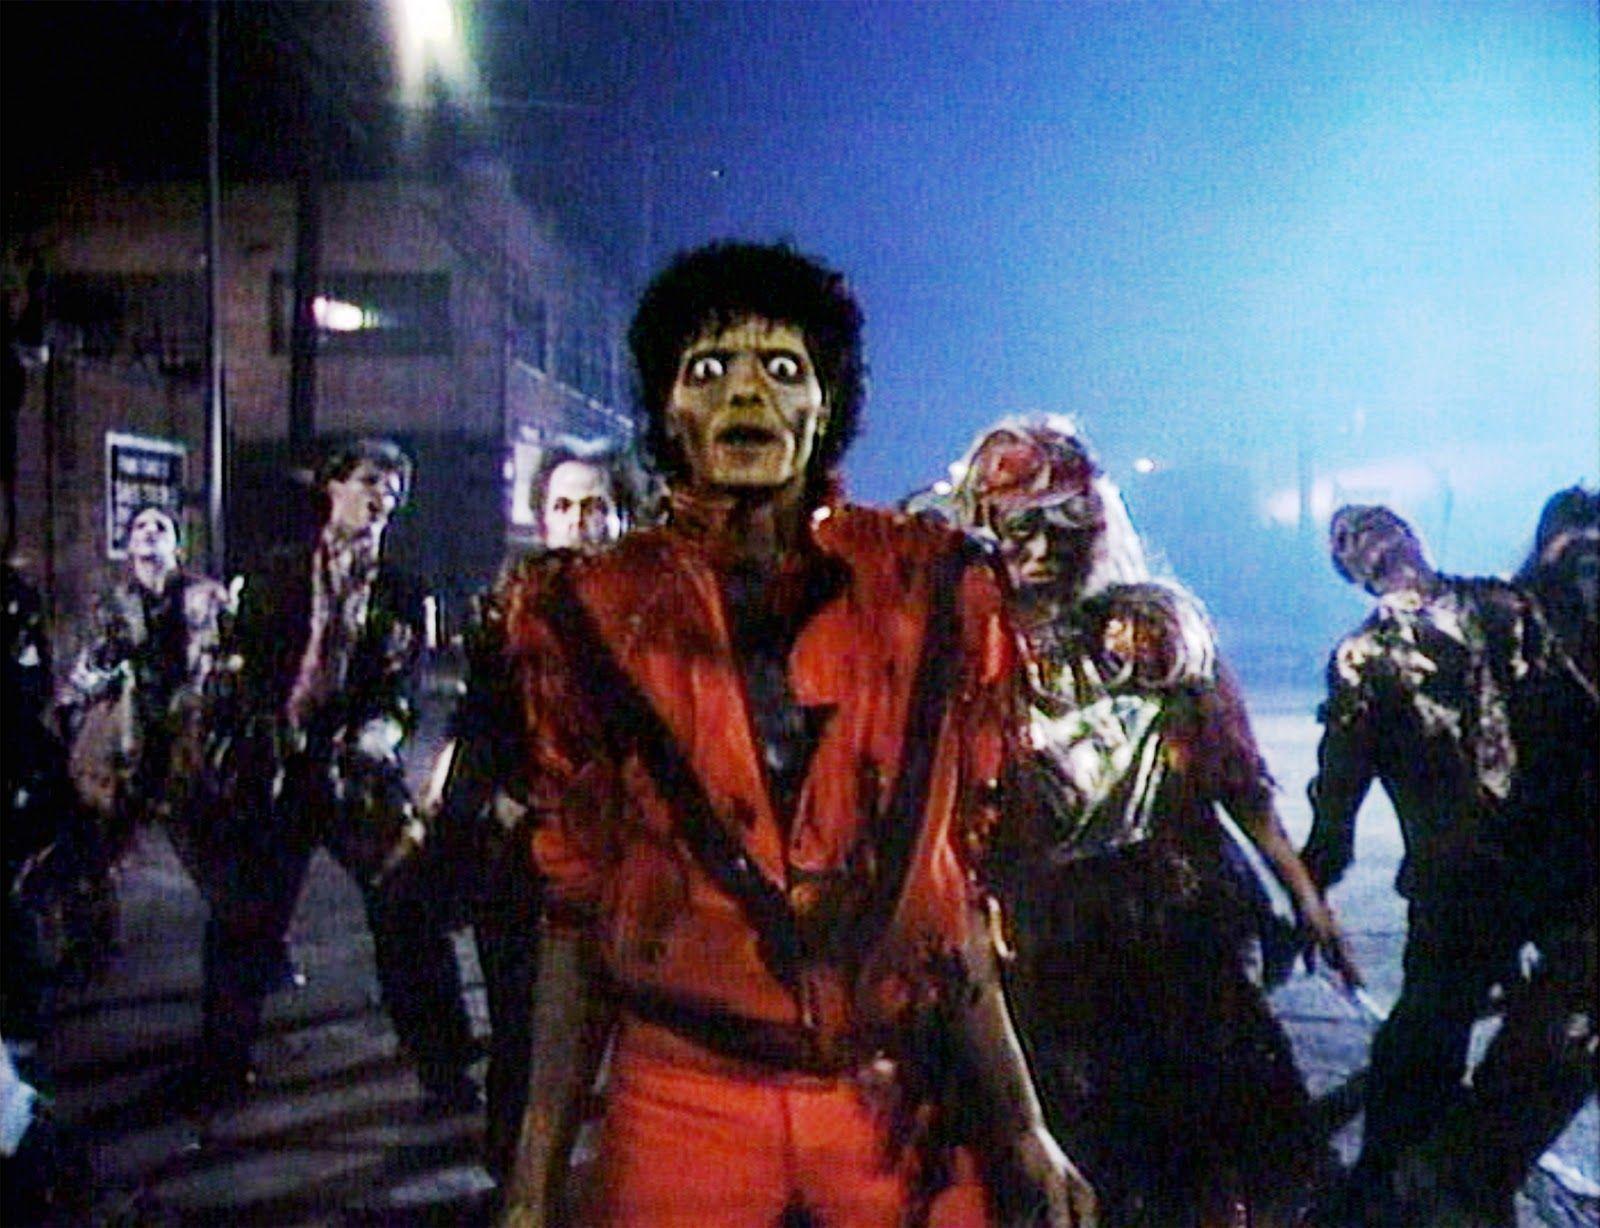 Michael Jackson Thriller Wallpapers - 222.5KB